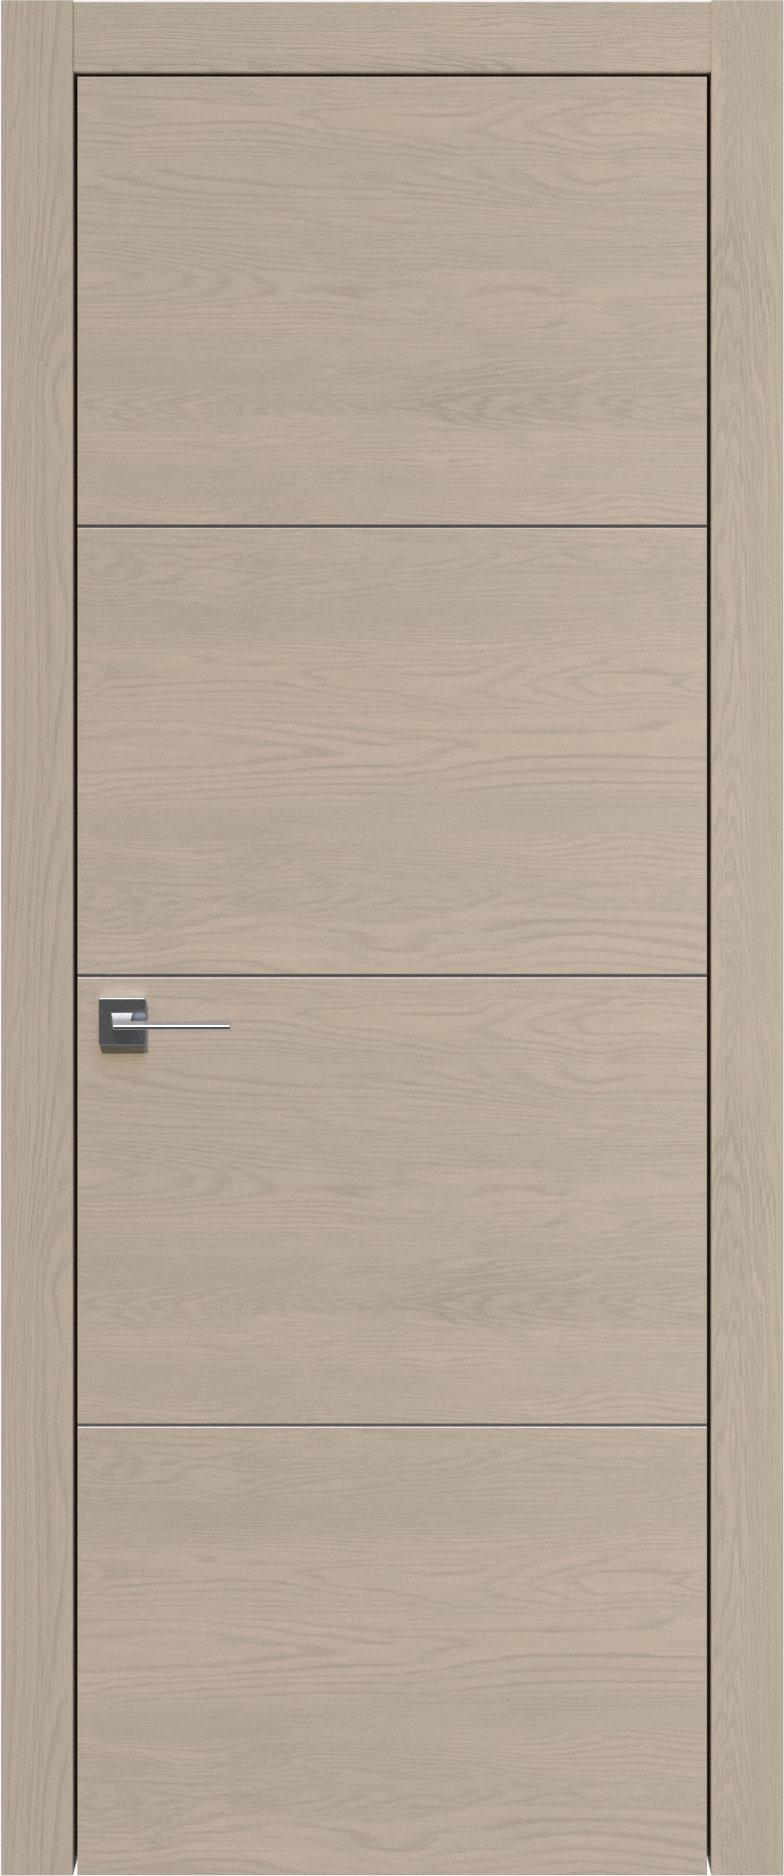 Tivoli Г-3 цвет - Дуб муар Без стекла (ДГ)